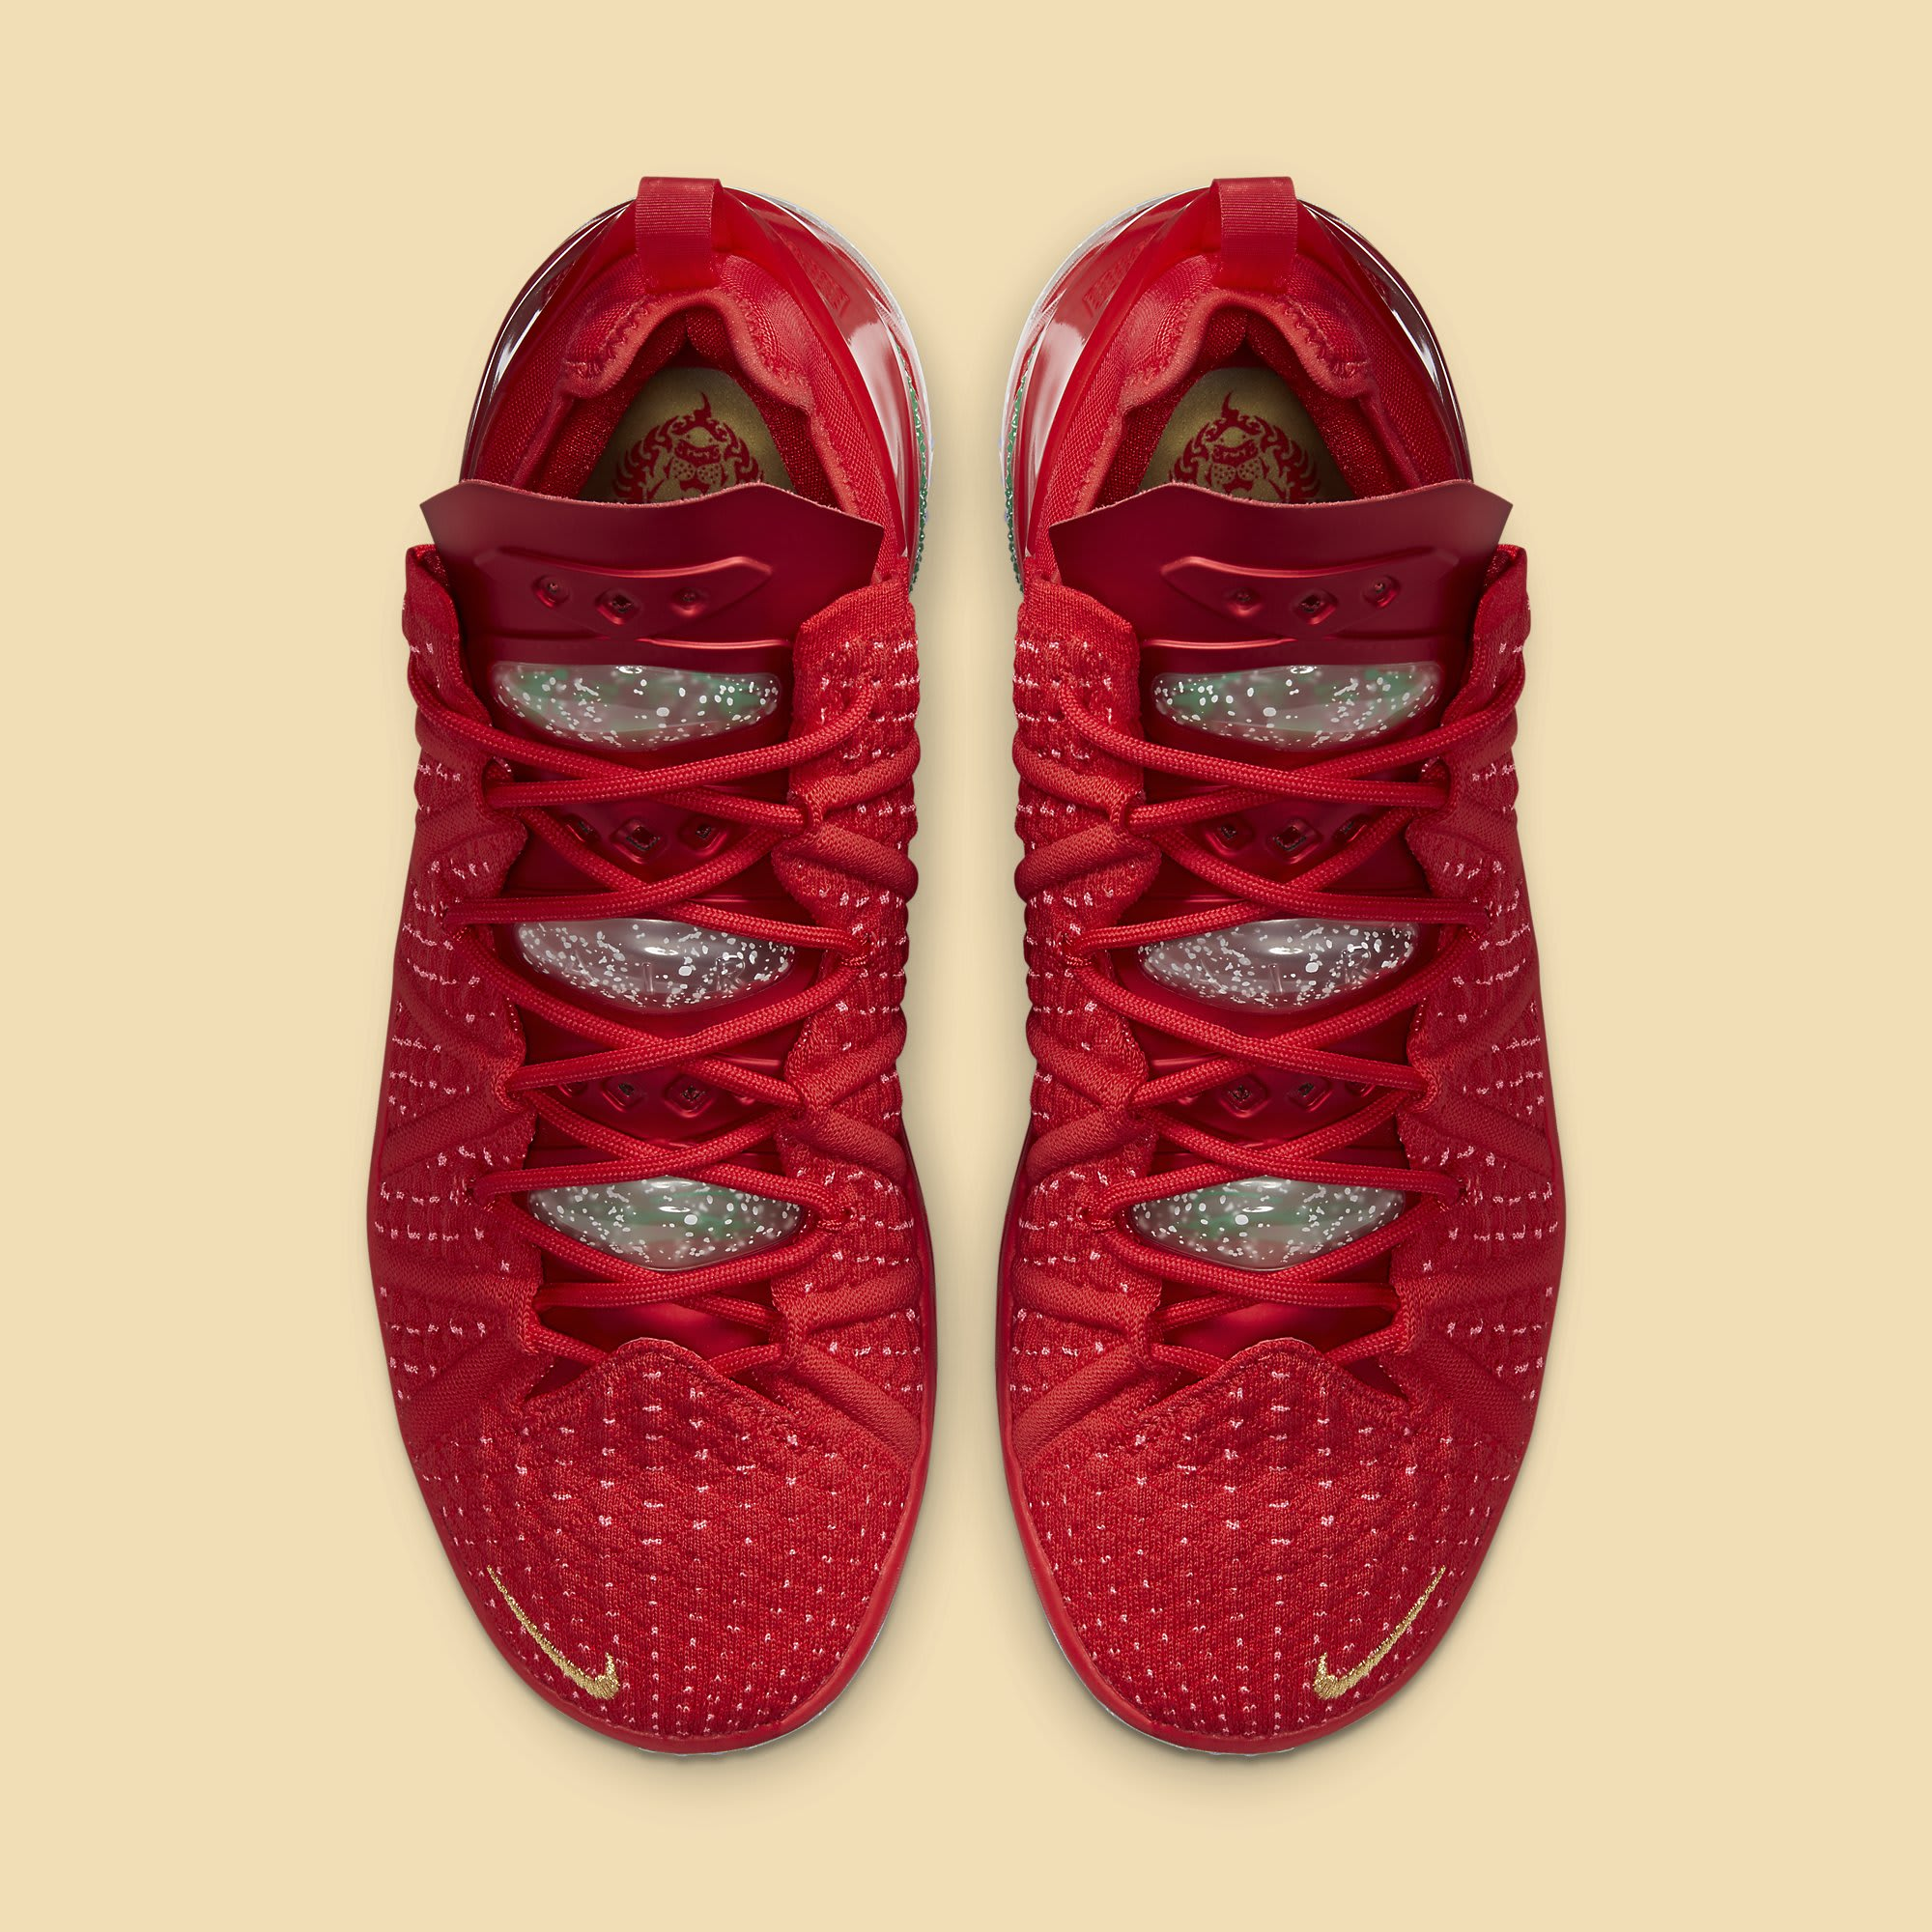 Nike LeBron 18 X-Mas in LA Release Date DB8148-601 Top